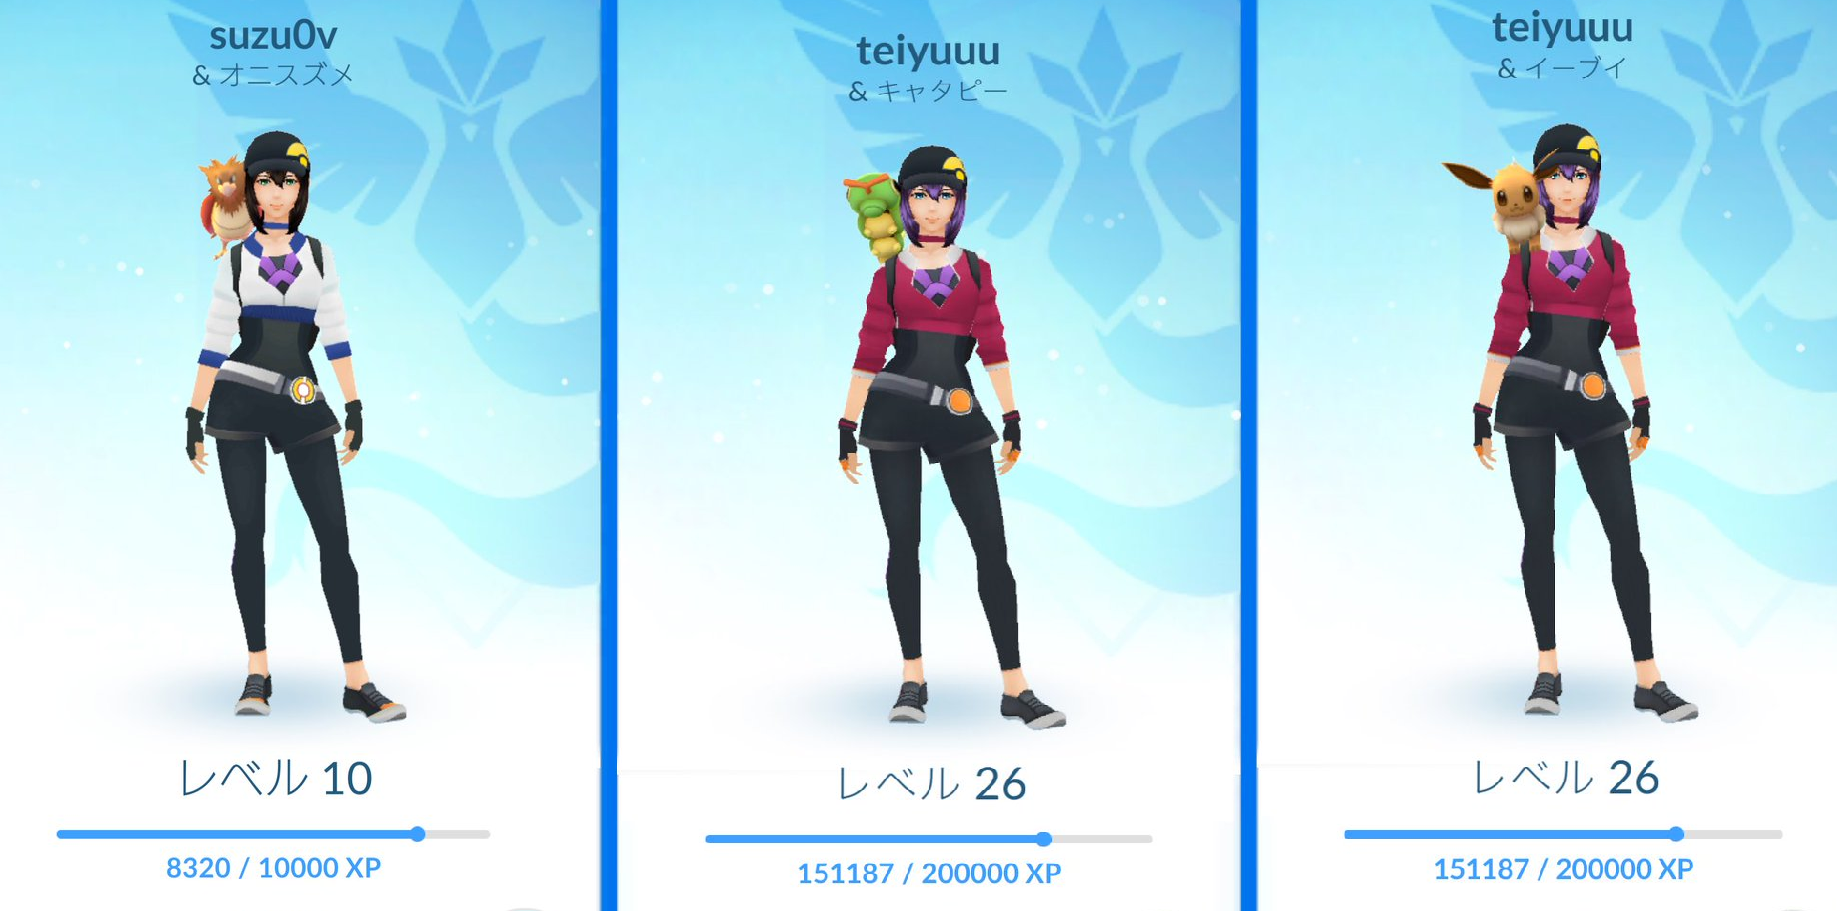 pokemon-go buddy